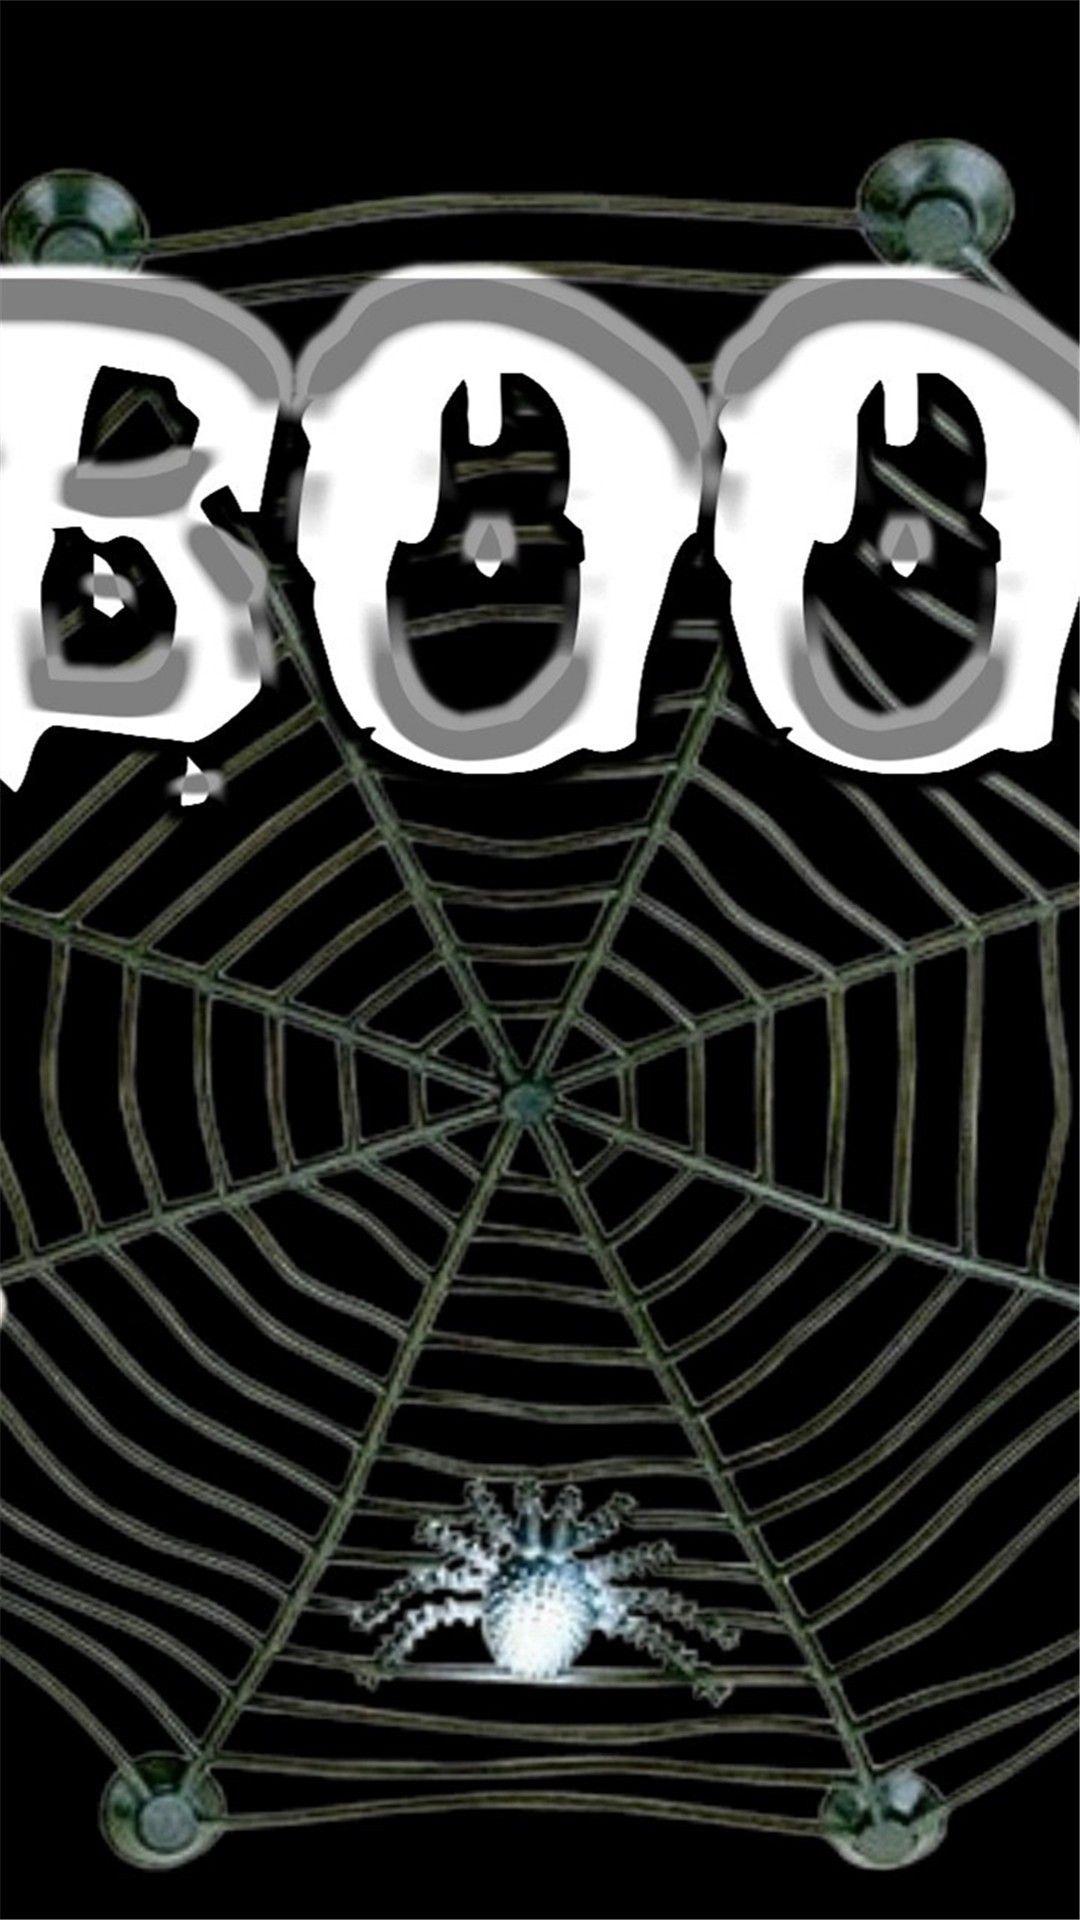 Great Wallpaper Halloween Spider - 3ba42b3e1df040c31970631e183a3084  Pictures_38607.jpg